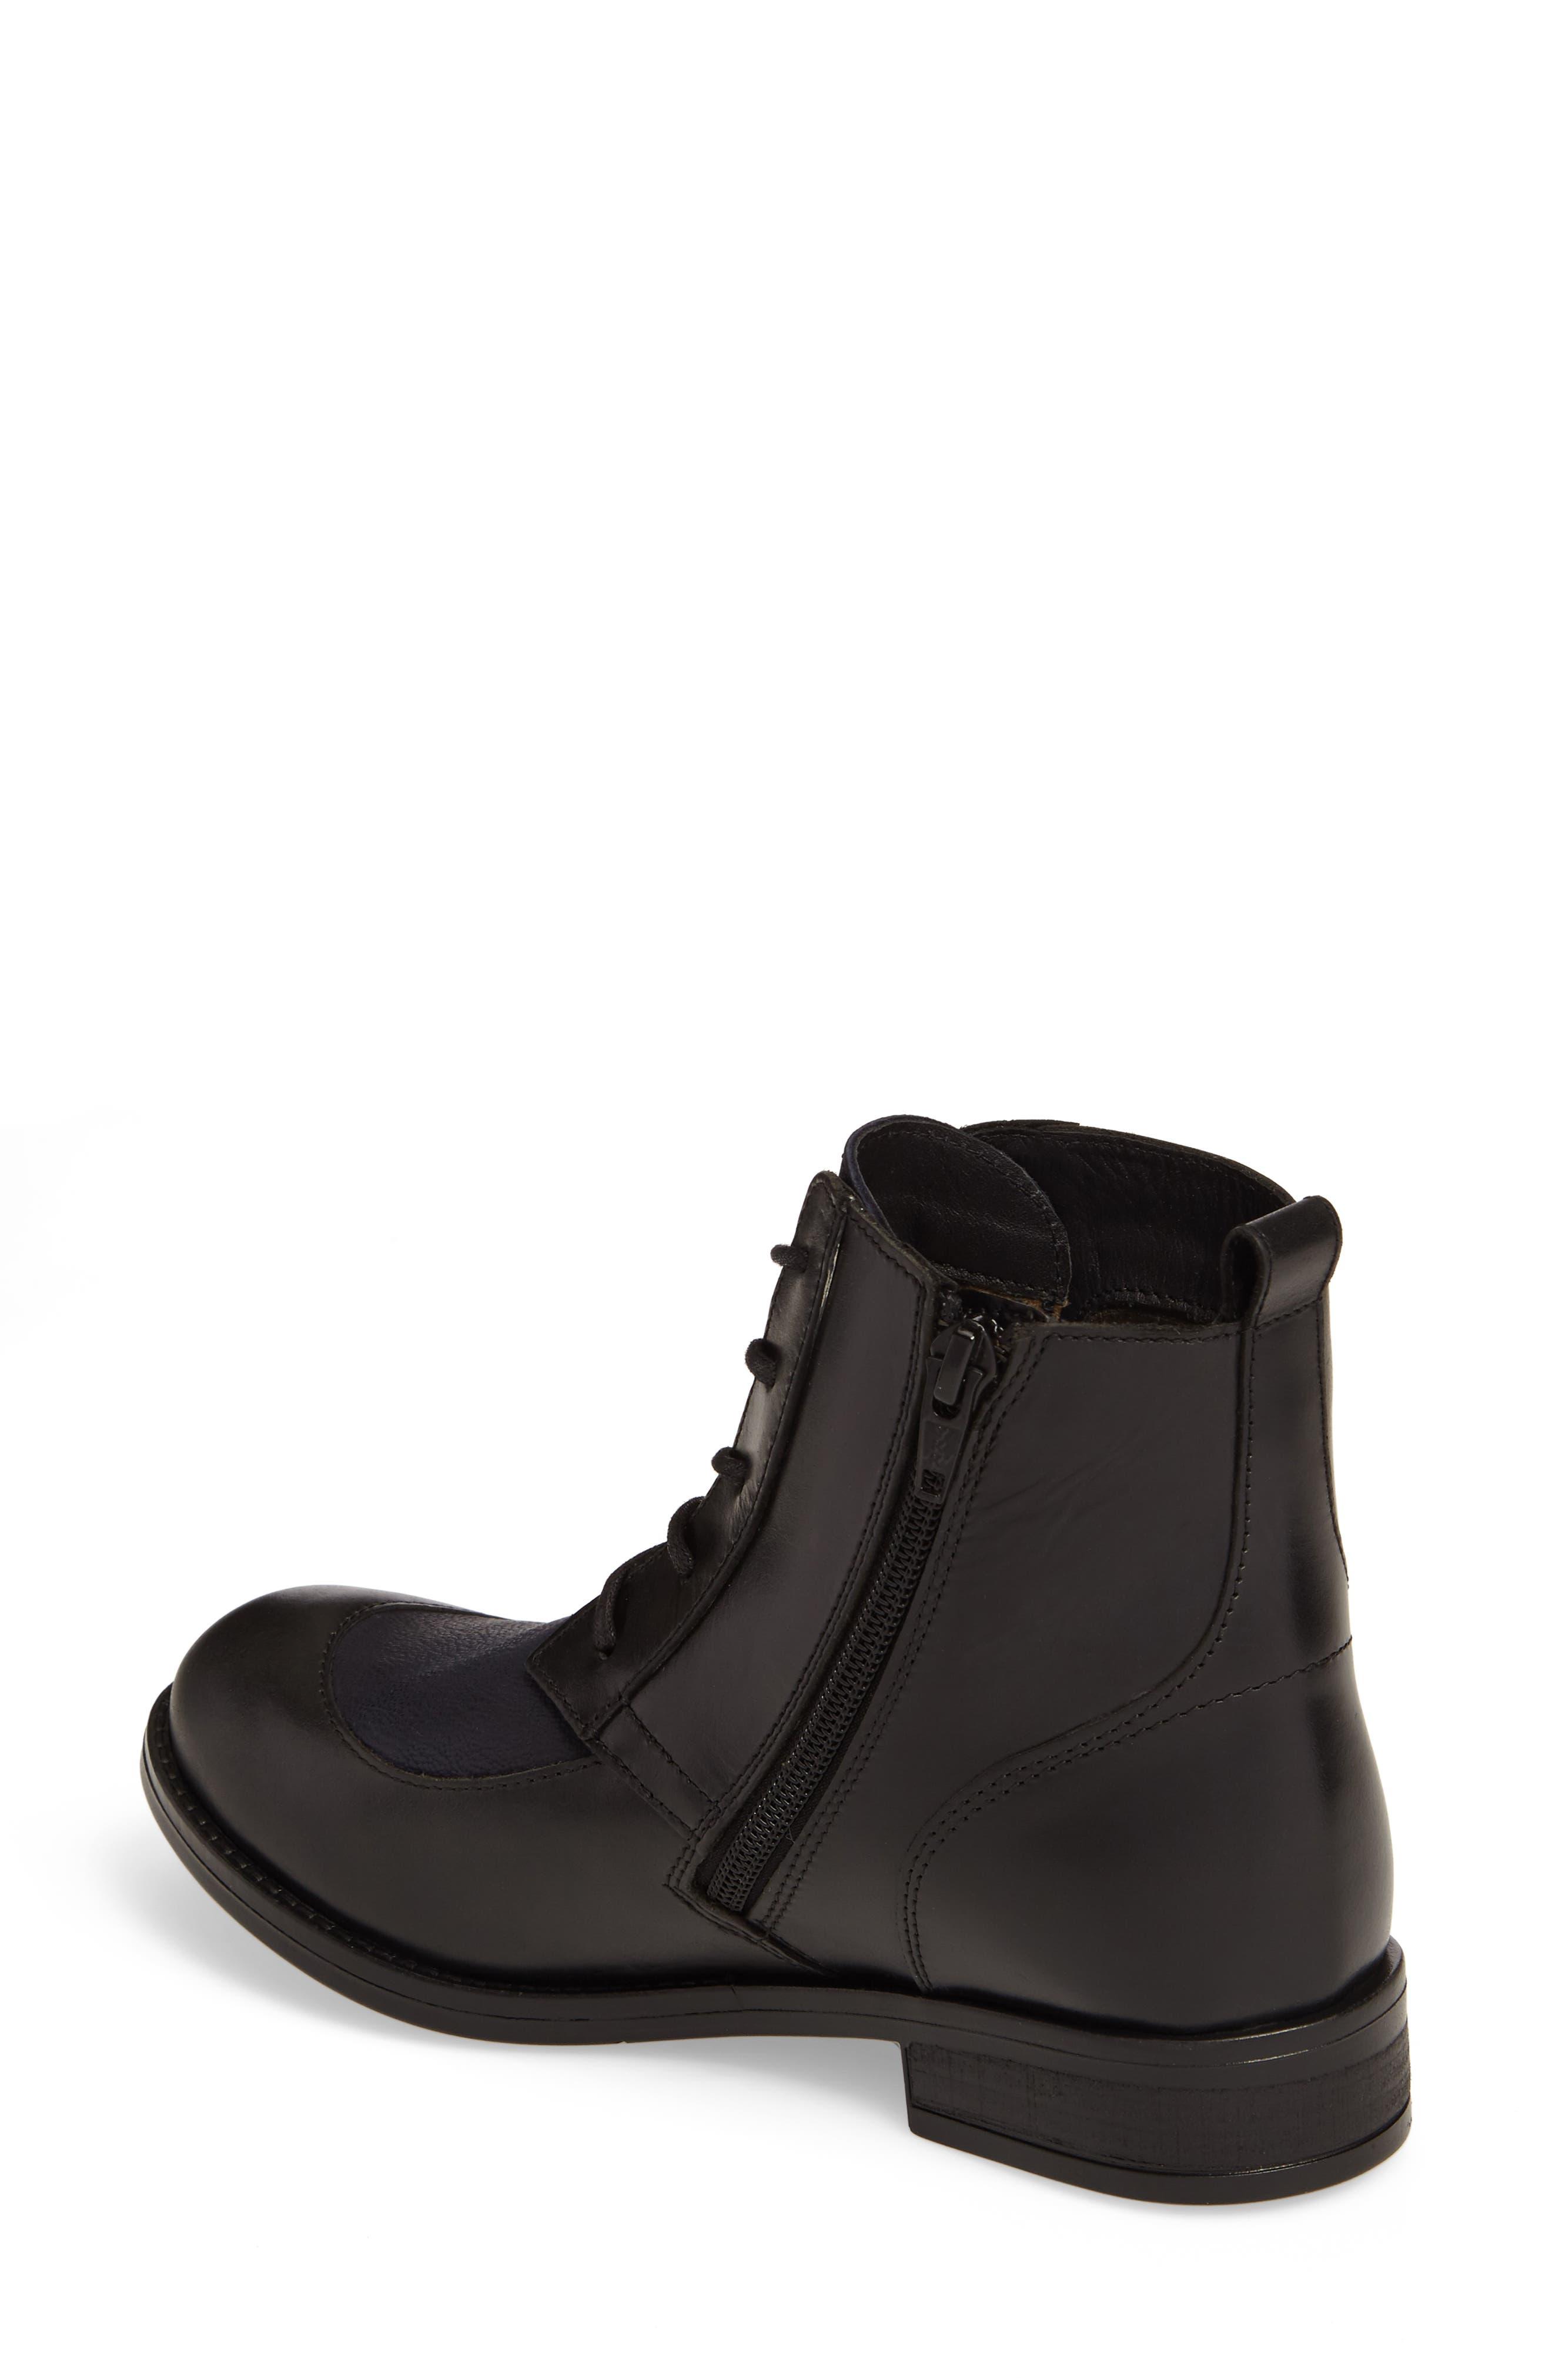 Arty Boot,                             Alternate thumbnail 2, color,                             Black/ Ocean Leather